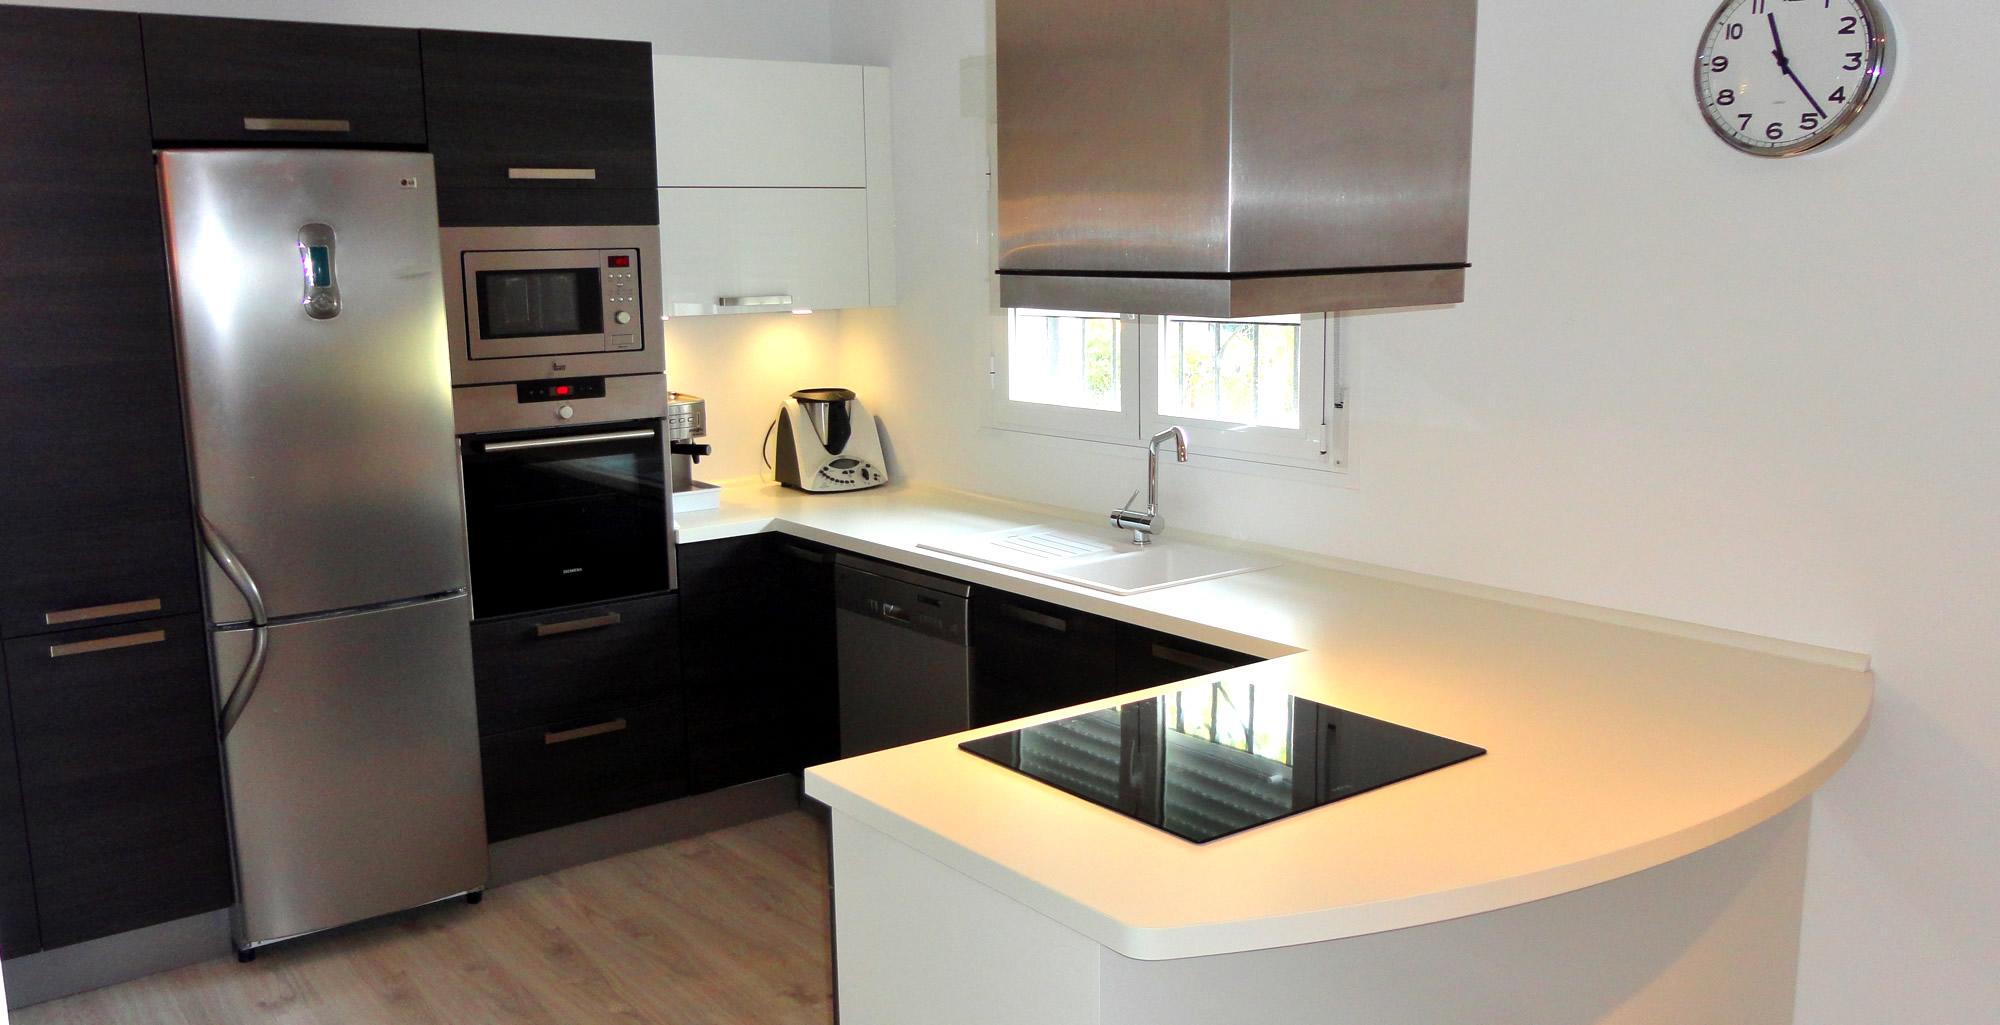 Muebles de cocina en madera con dise o actual - Replicas de muebles de diseno ...